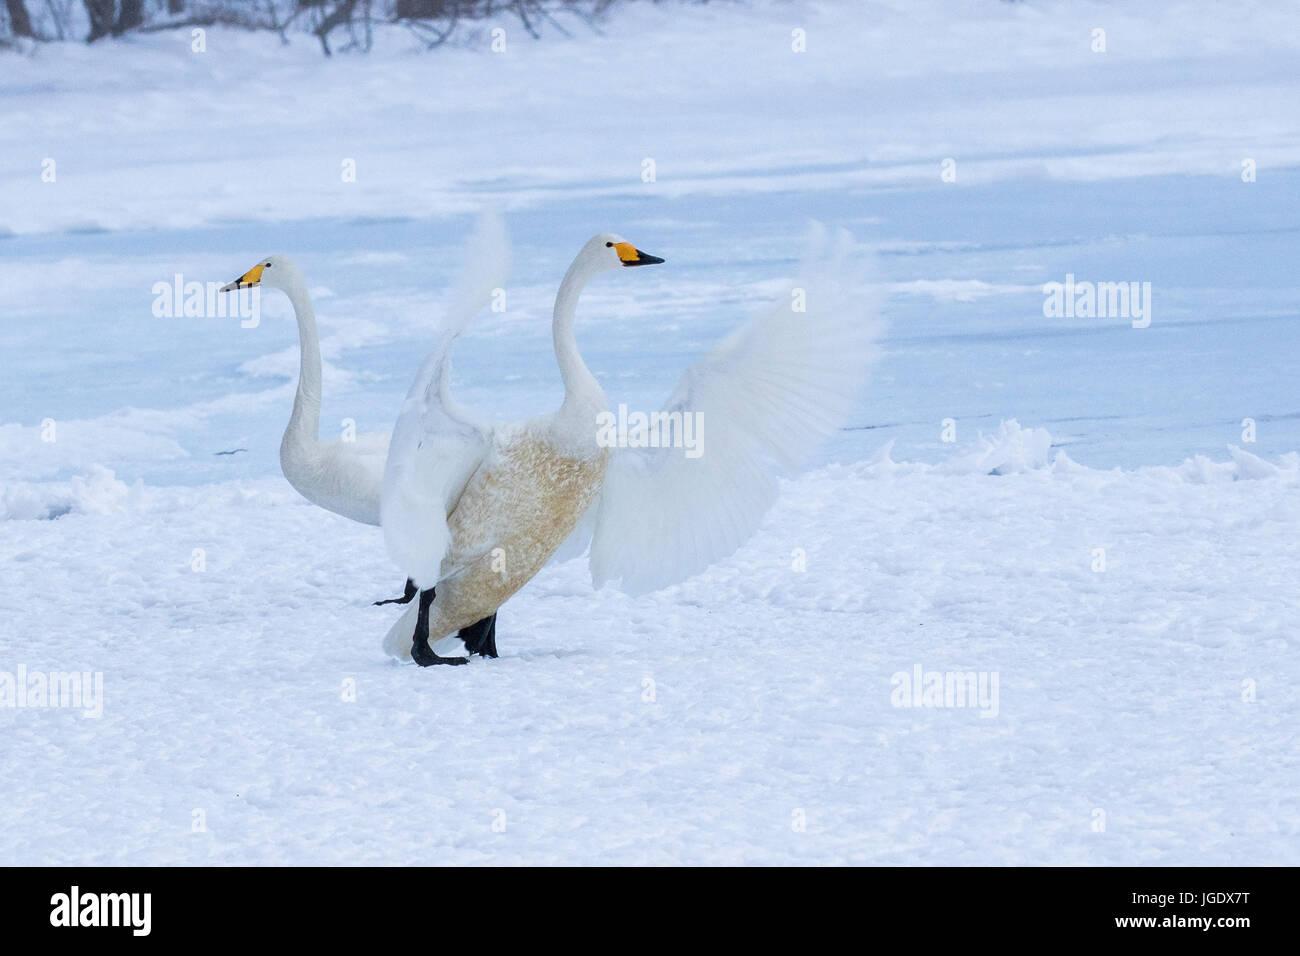 Song swans, Cygnus cygnus, Singschwäne (Cygnus cygnus) Stock Photo